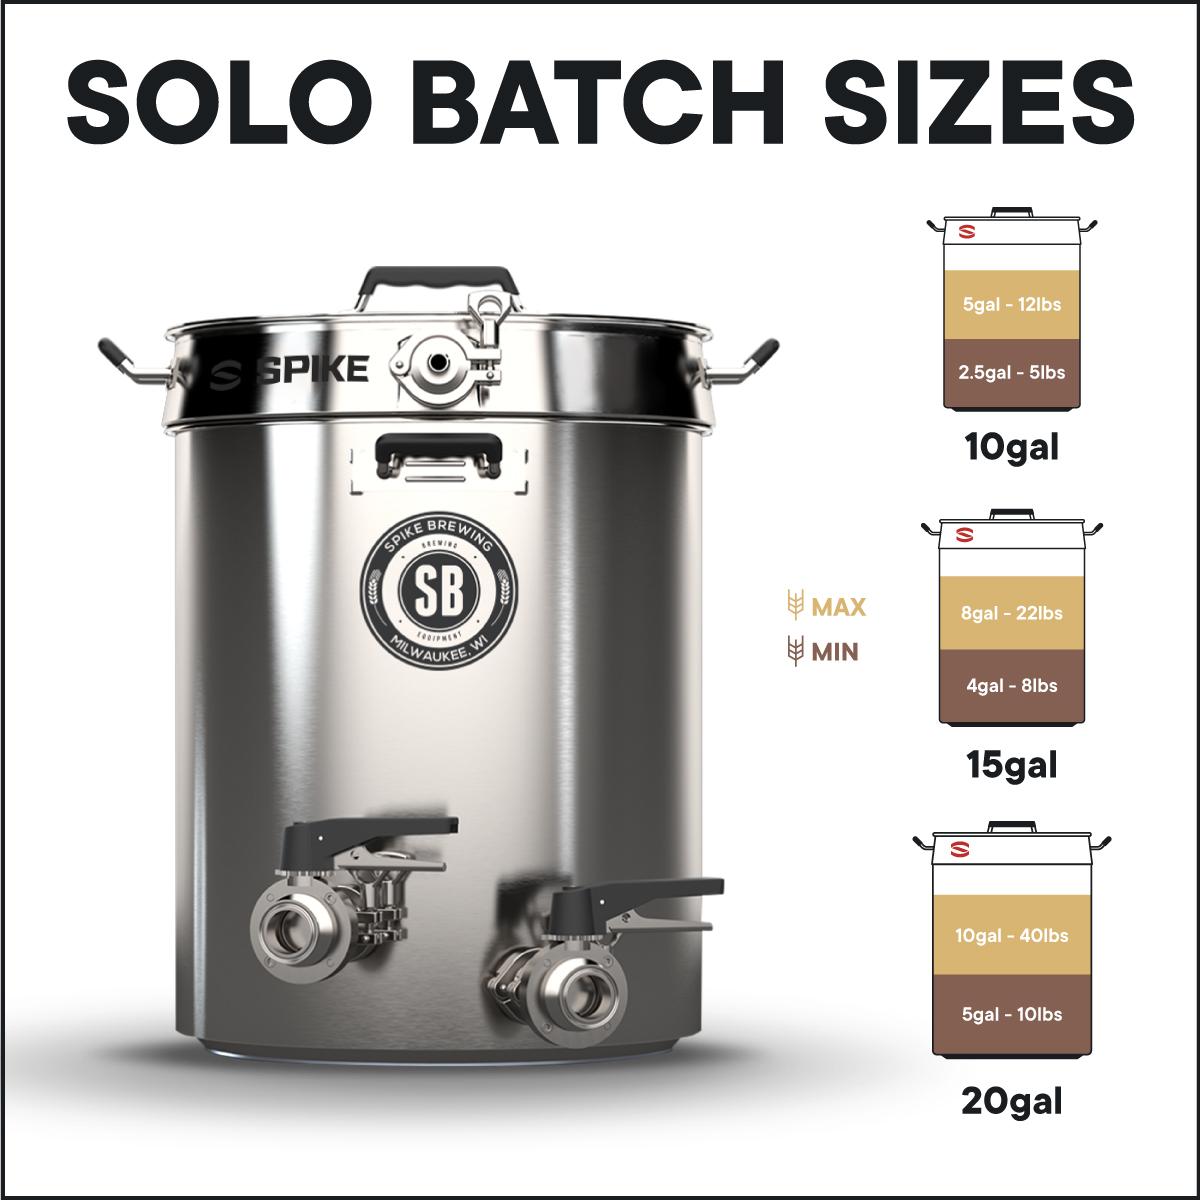 2_100920_Solo-Batch-Size-Infographic_SE-1